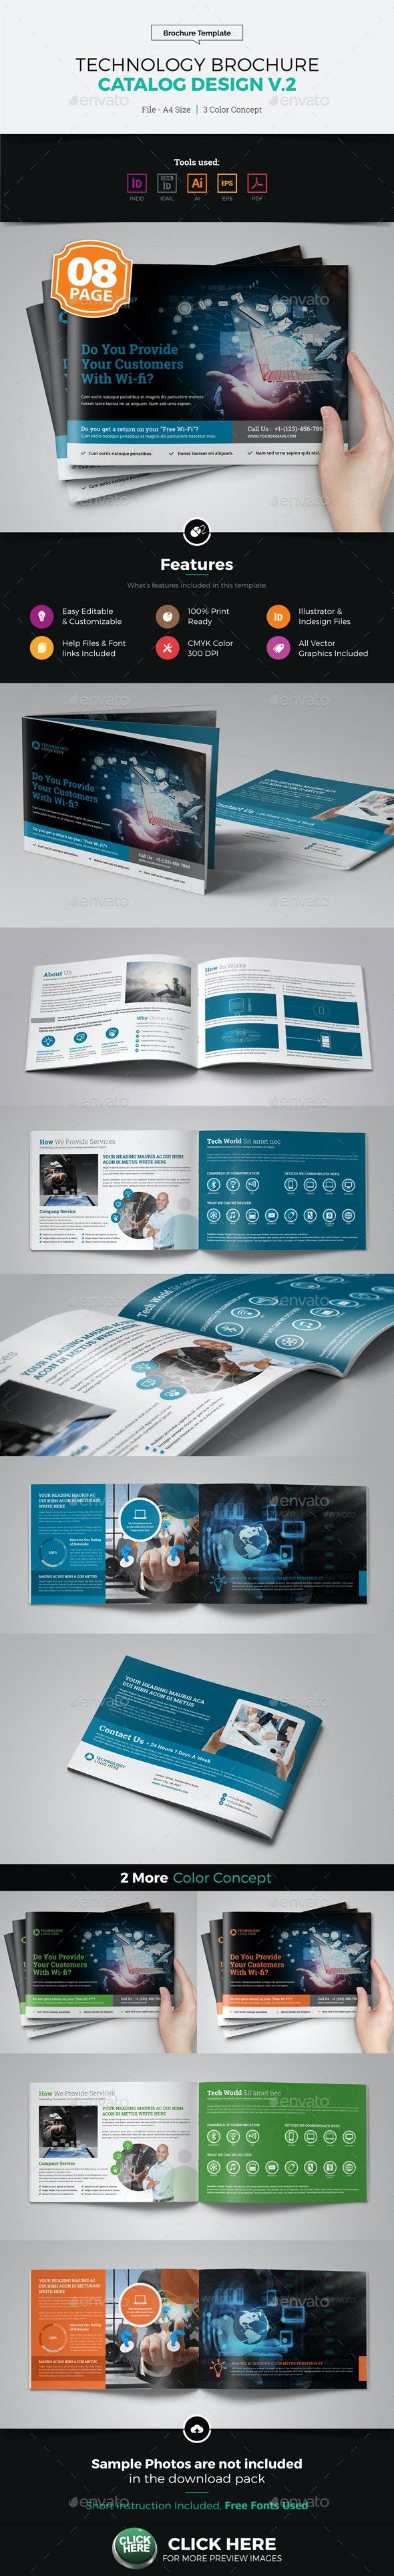 Technology Brochure Catalog Template v2 - Corporate Brochures